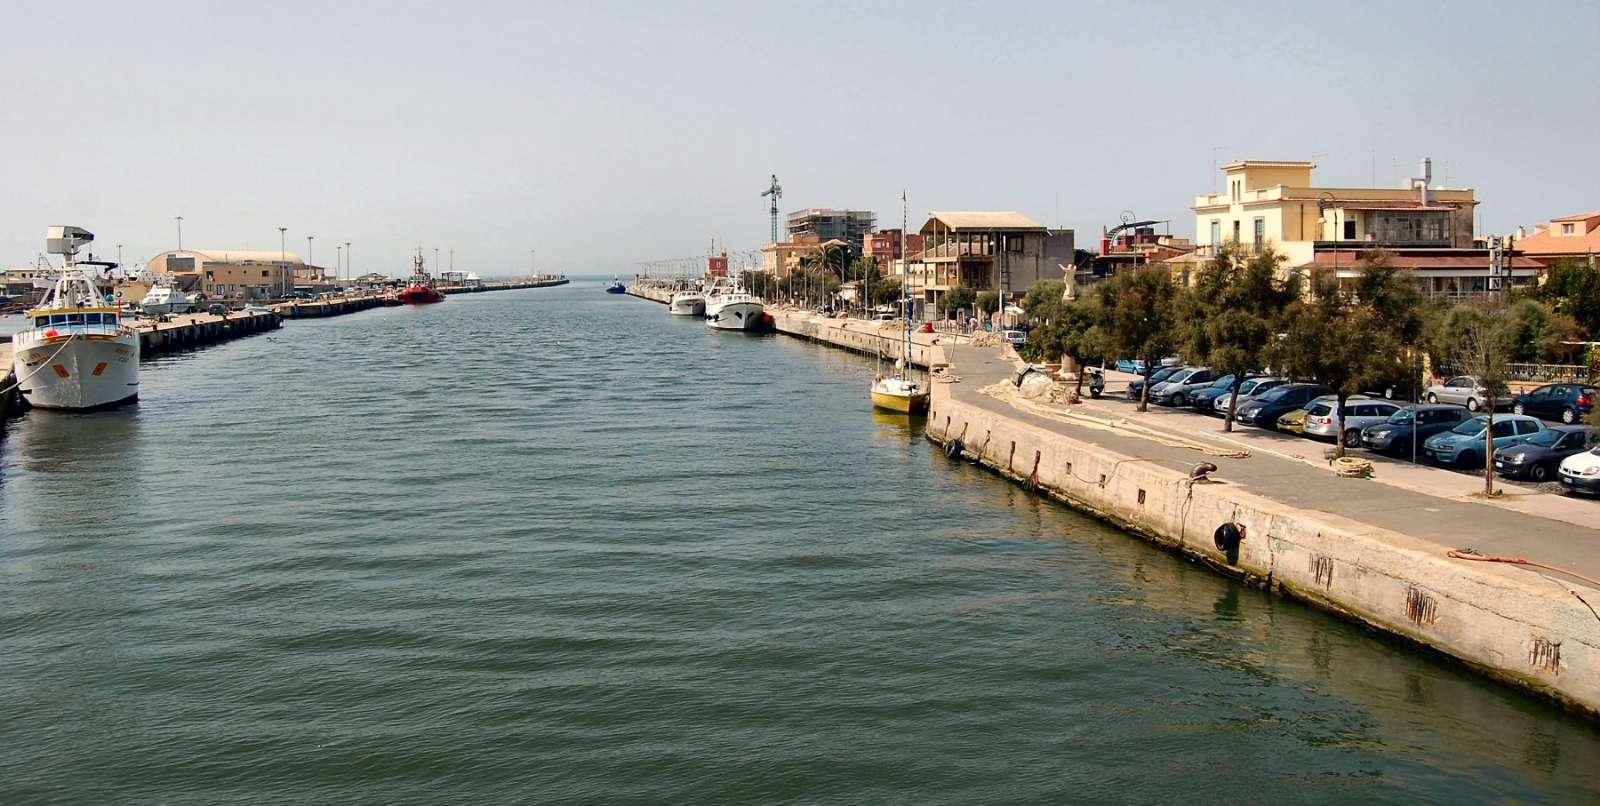 Middelhavet anes i baggrunden